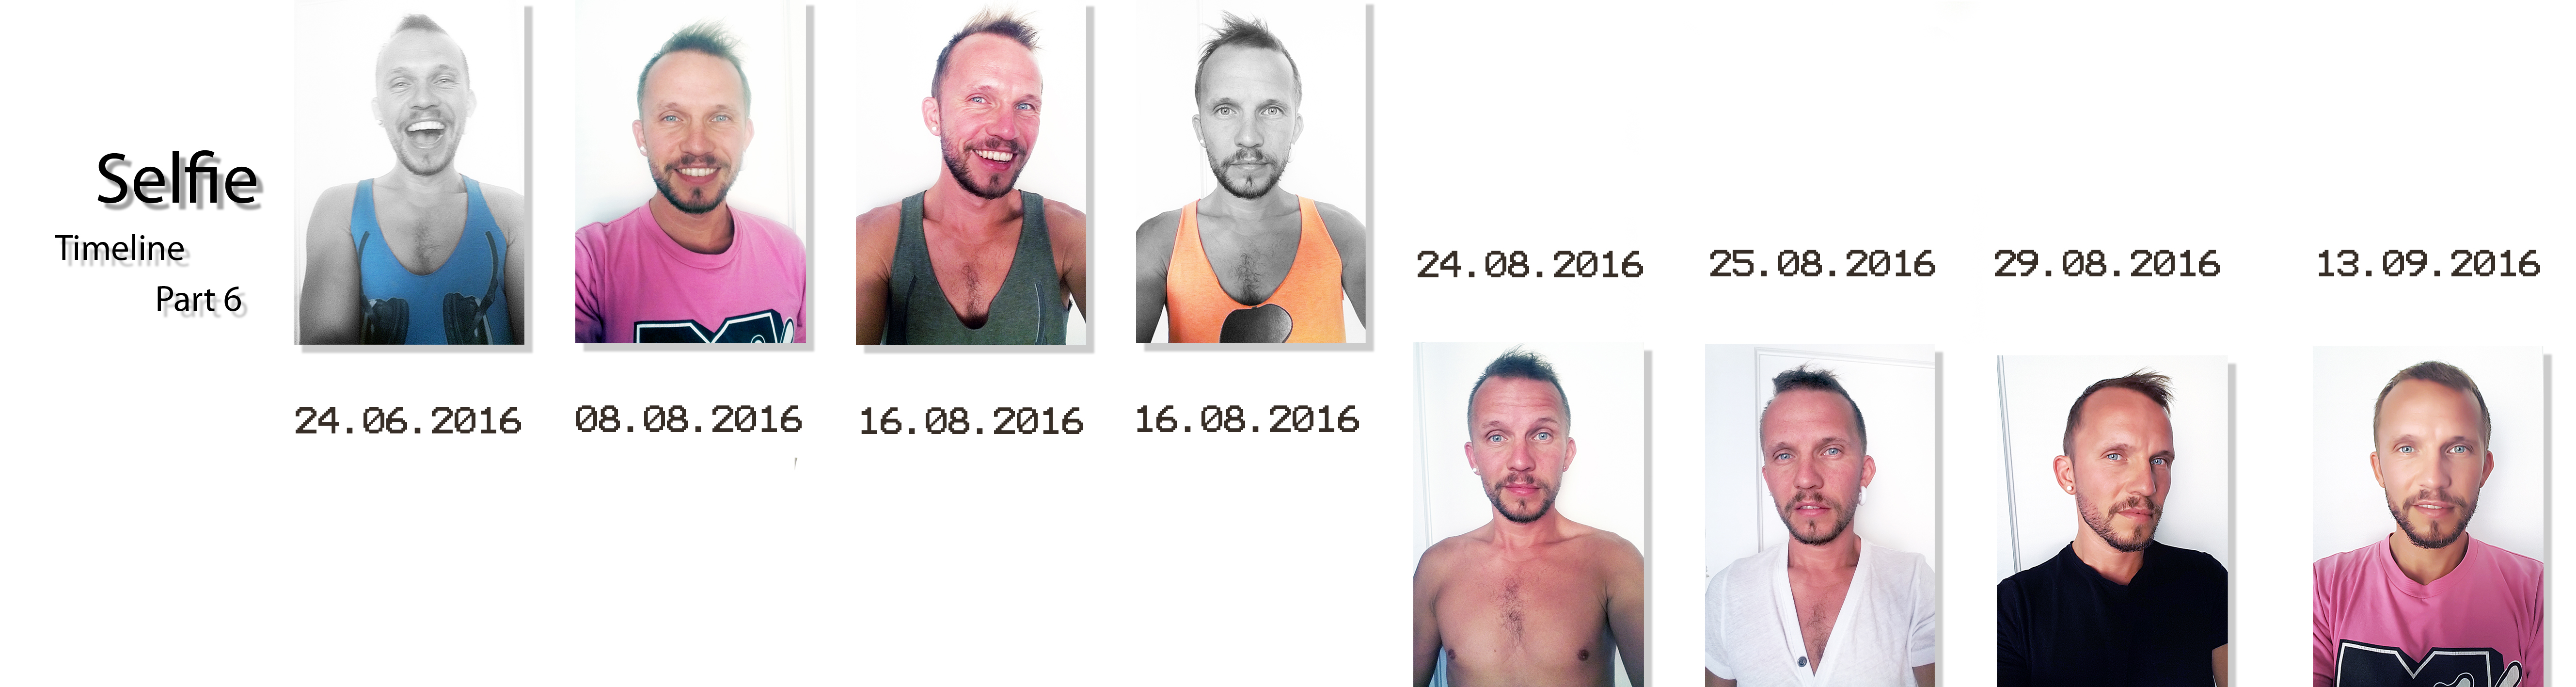 04_Selfie_Timeline_P6